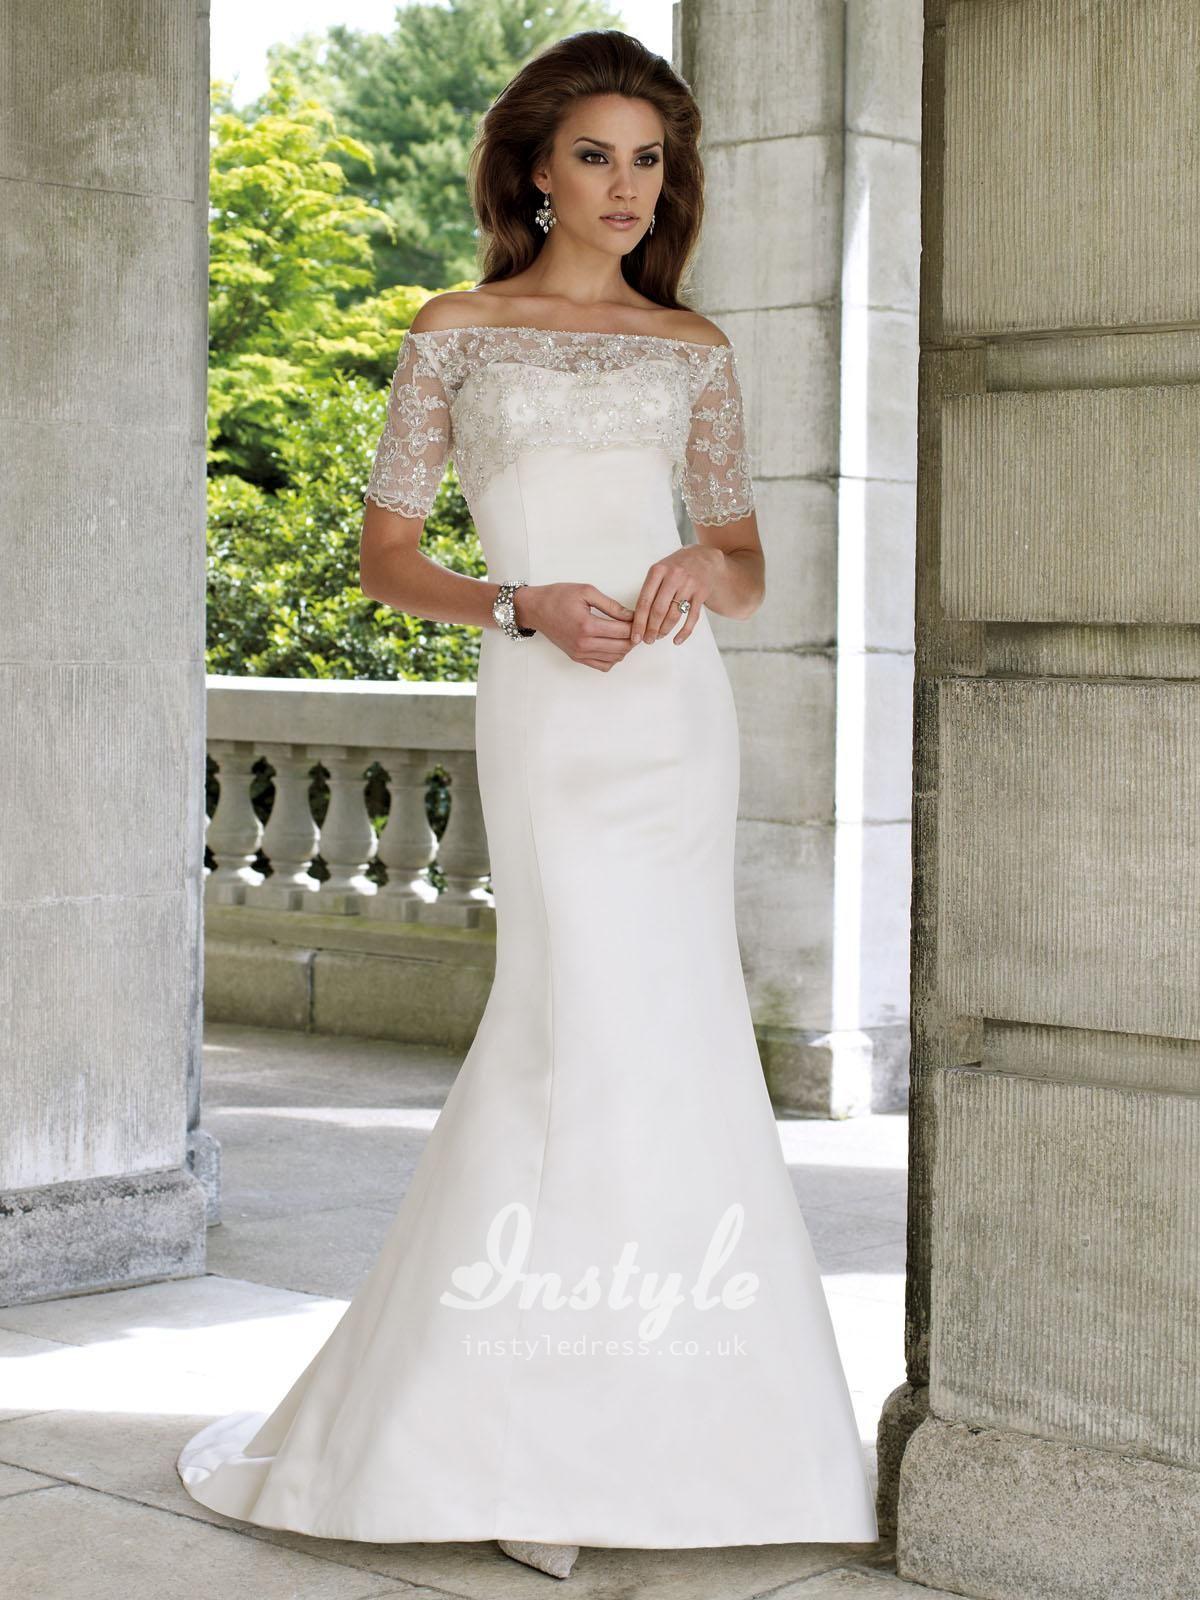 Trumpet style wedding dresses  Twopiece Satin Strapless Mermaid Wedding Dress UK with Offthe